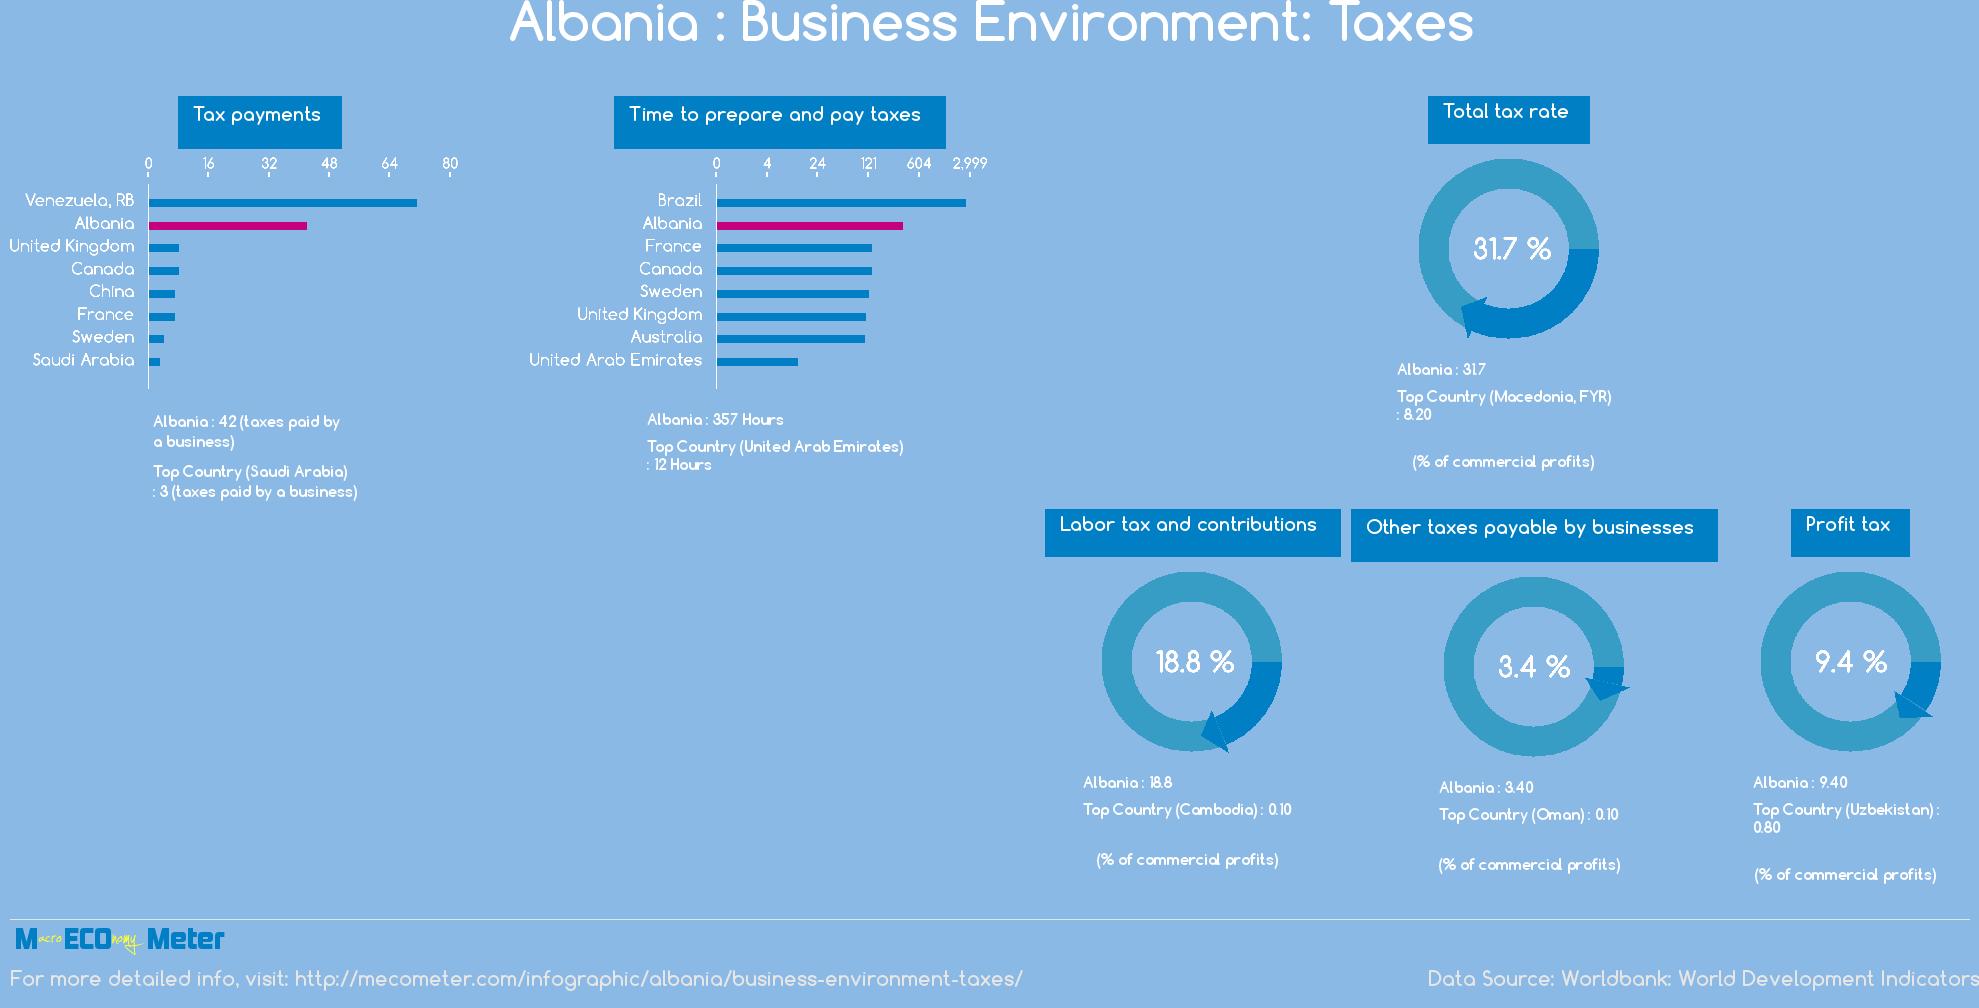 Albania : Business Environment: Taxes